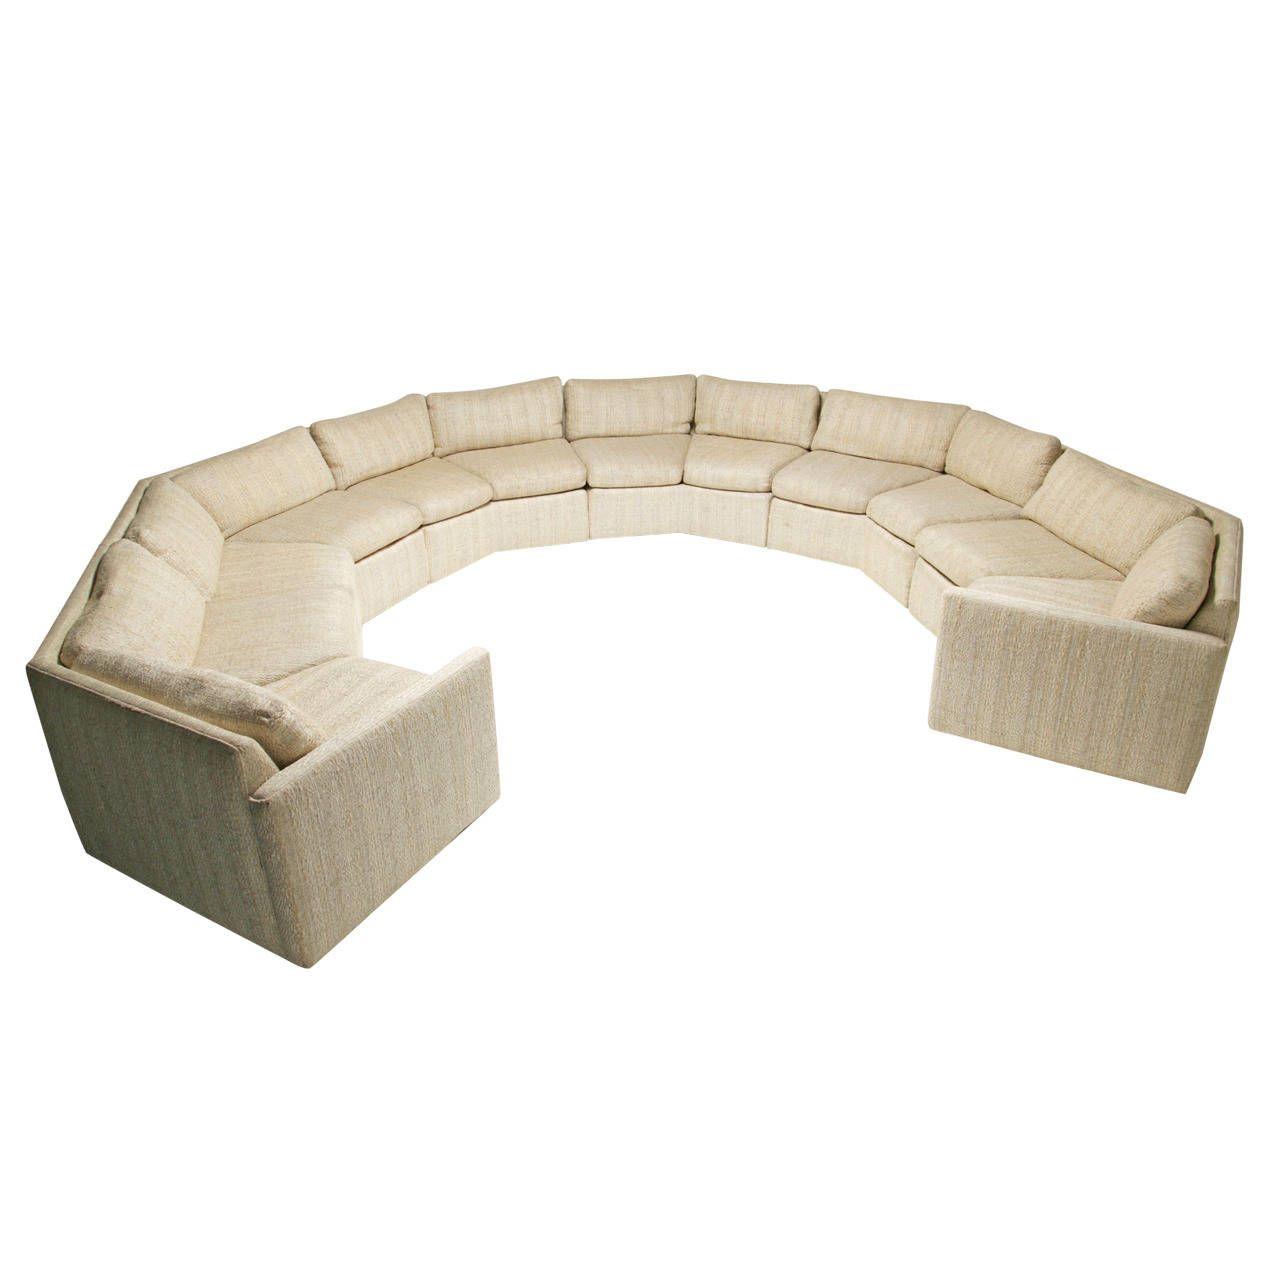 Phenomenal Mid Century Hexagonal Sectional Sofa In The Style Of Milo Inzonedesignstudio Interior Chair Design Inzonedesignstudiocom